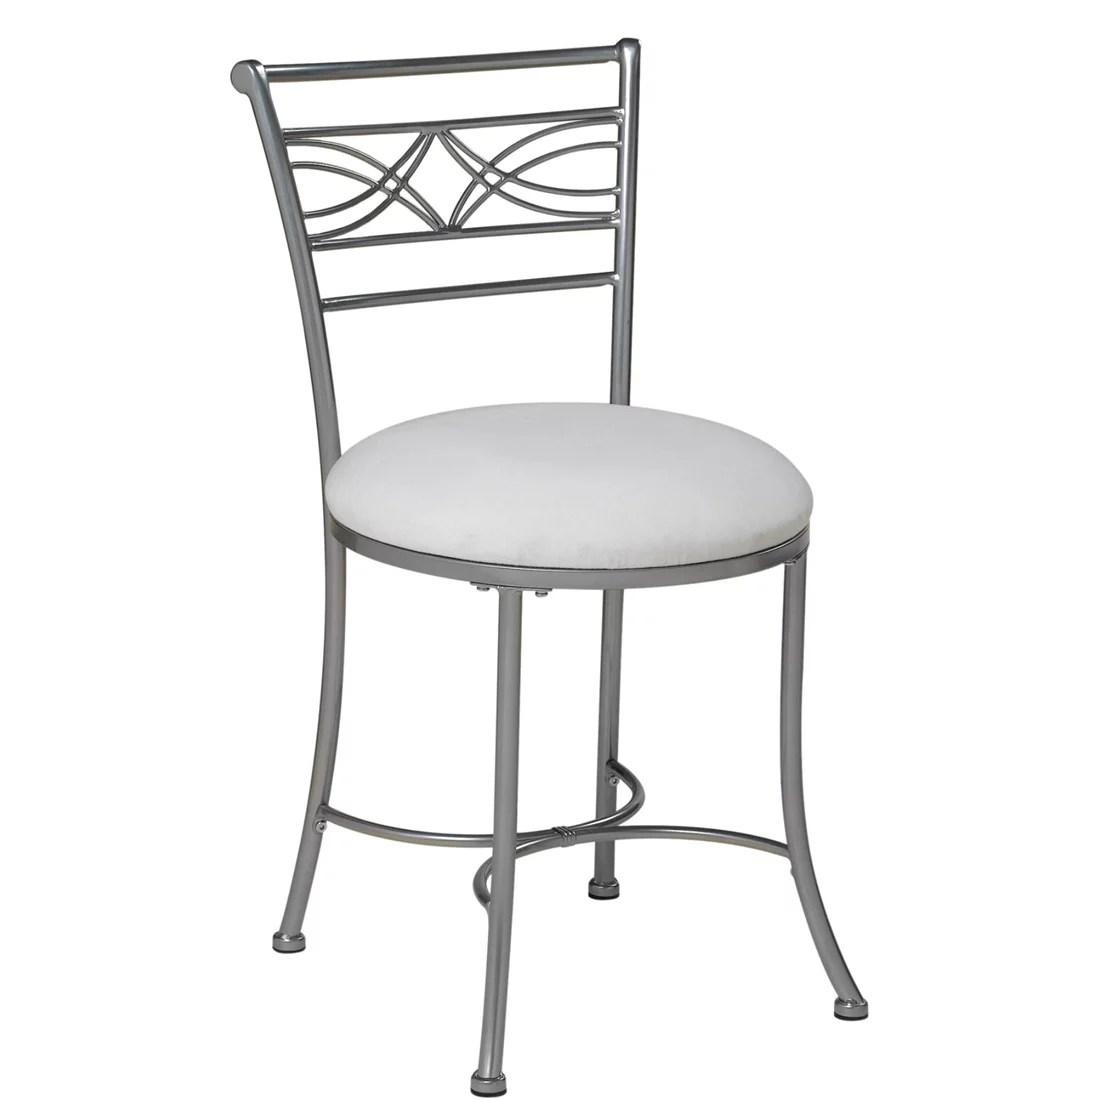 bathroom makeup chair cover rentals quad cities chrome vanity stool bedroom bath decor seat padded